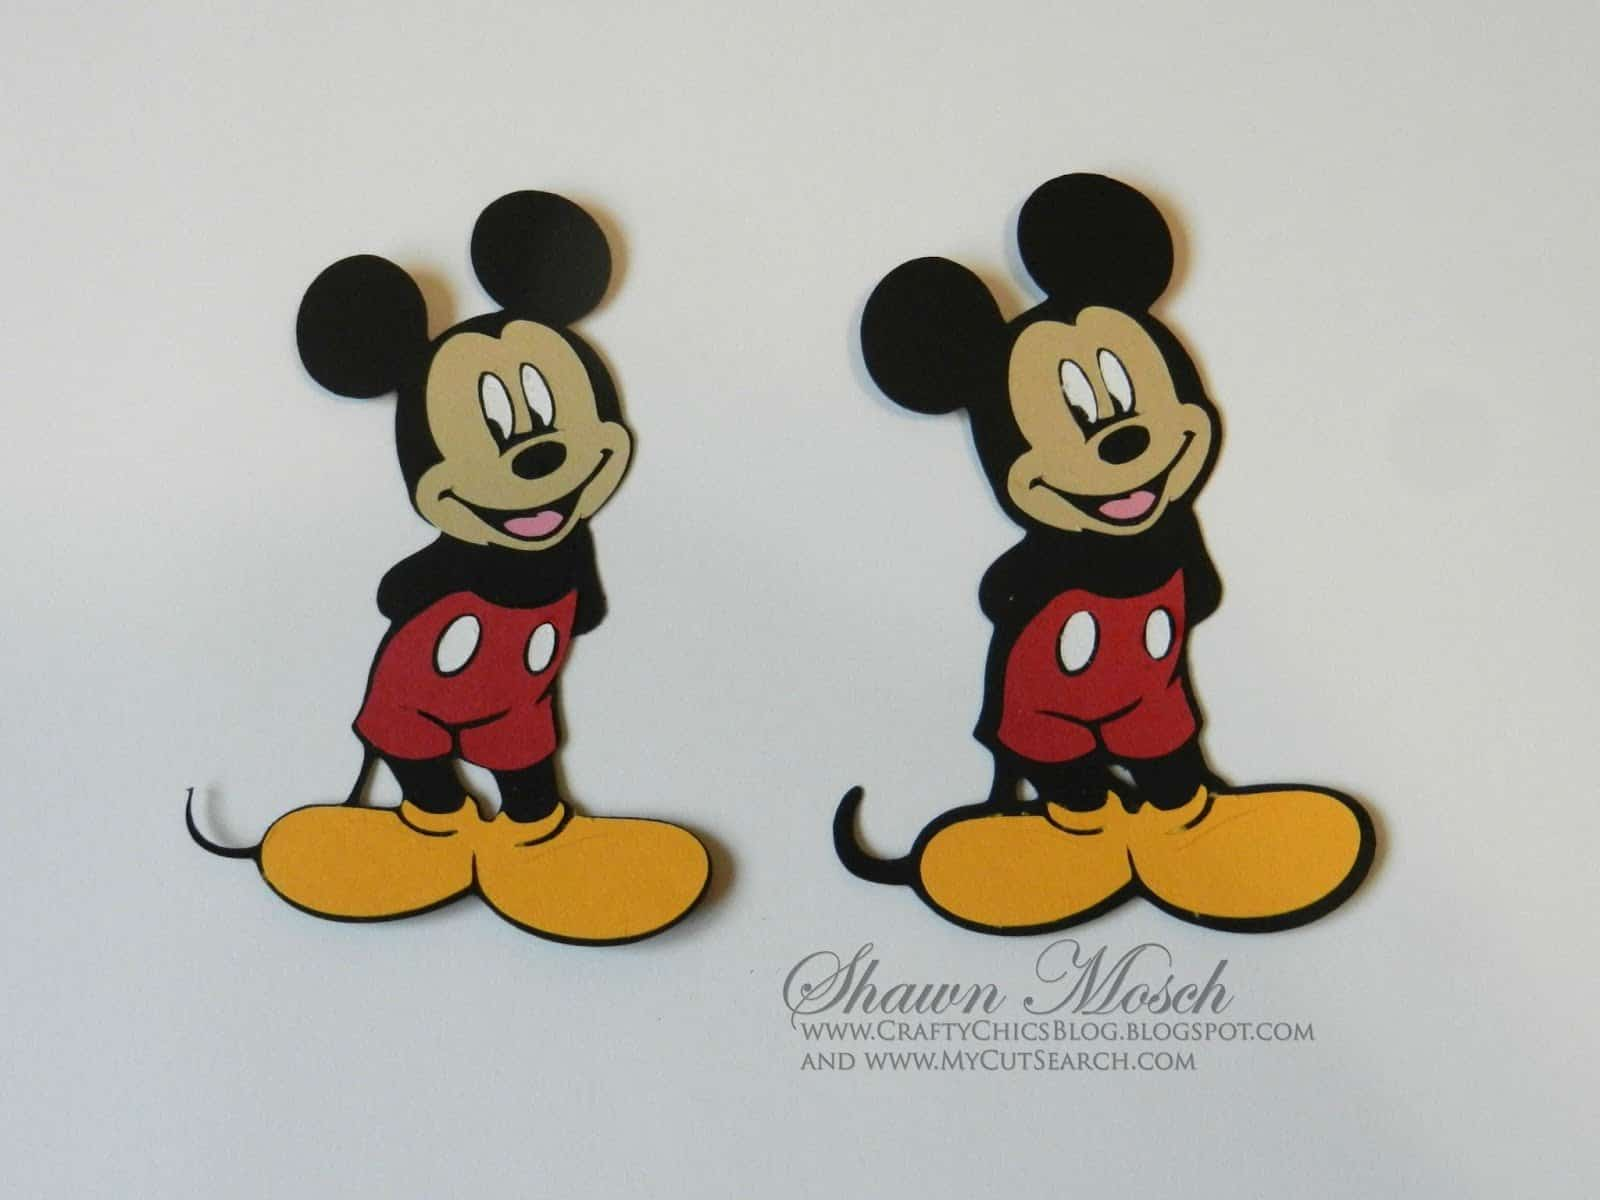 layering Disney images